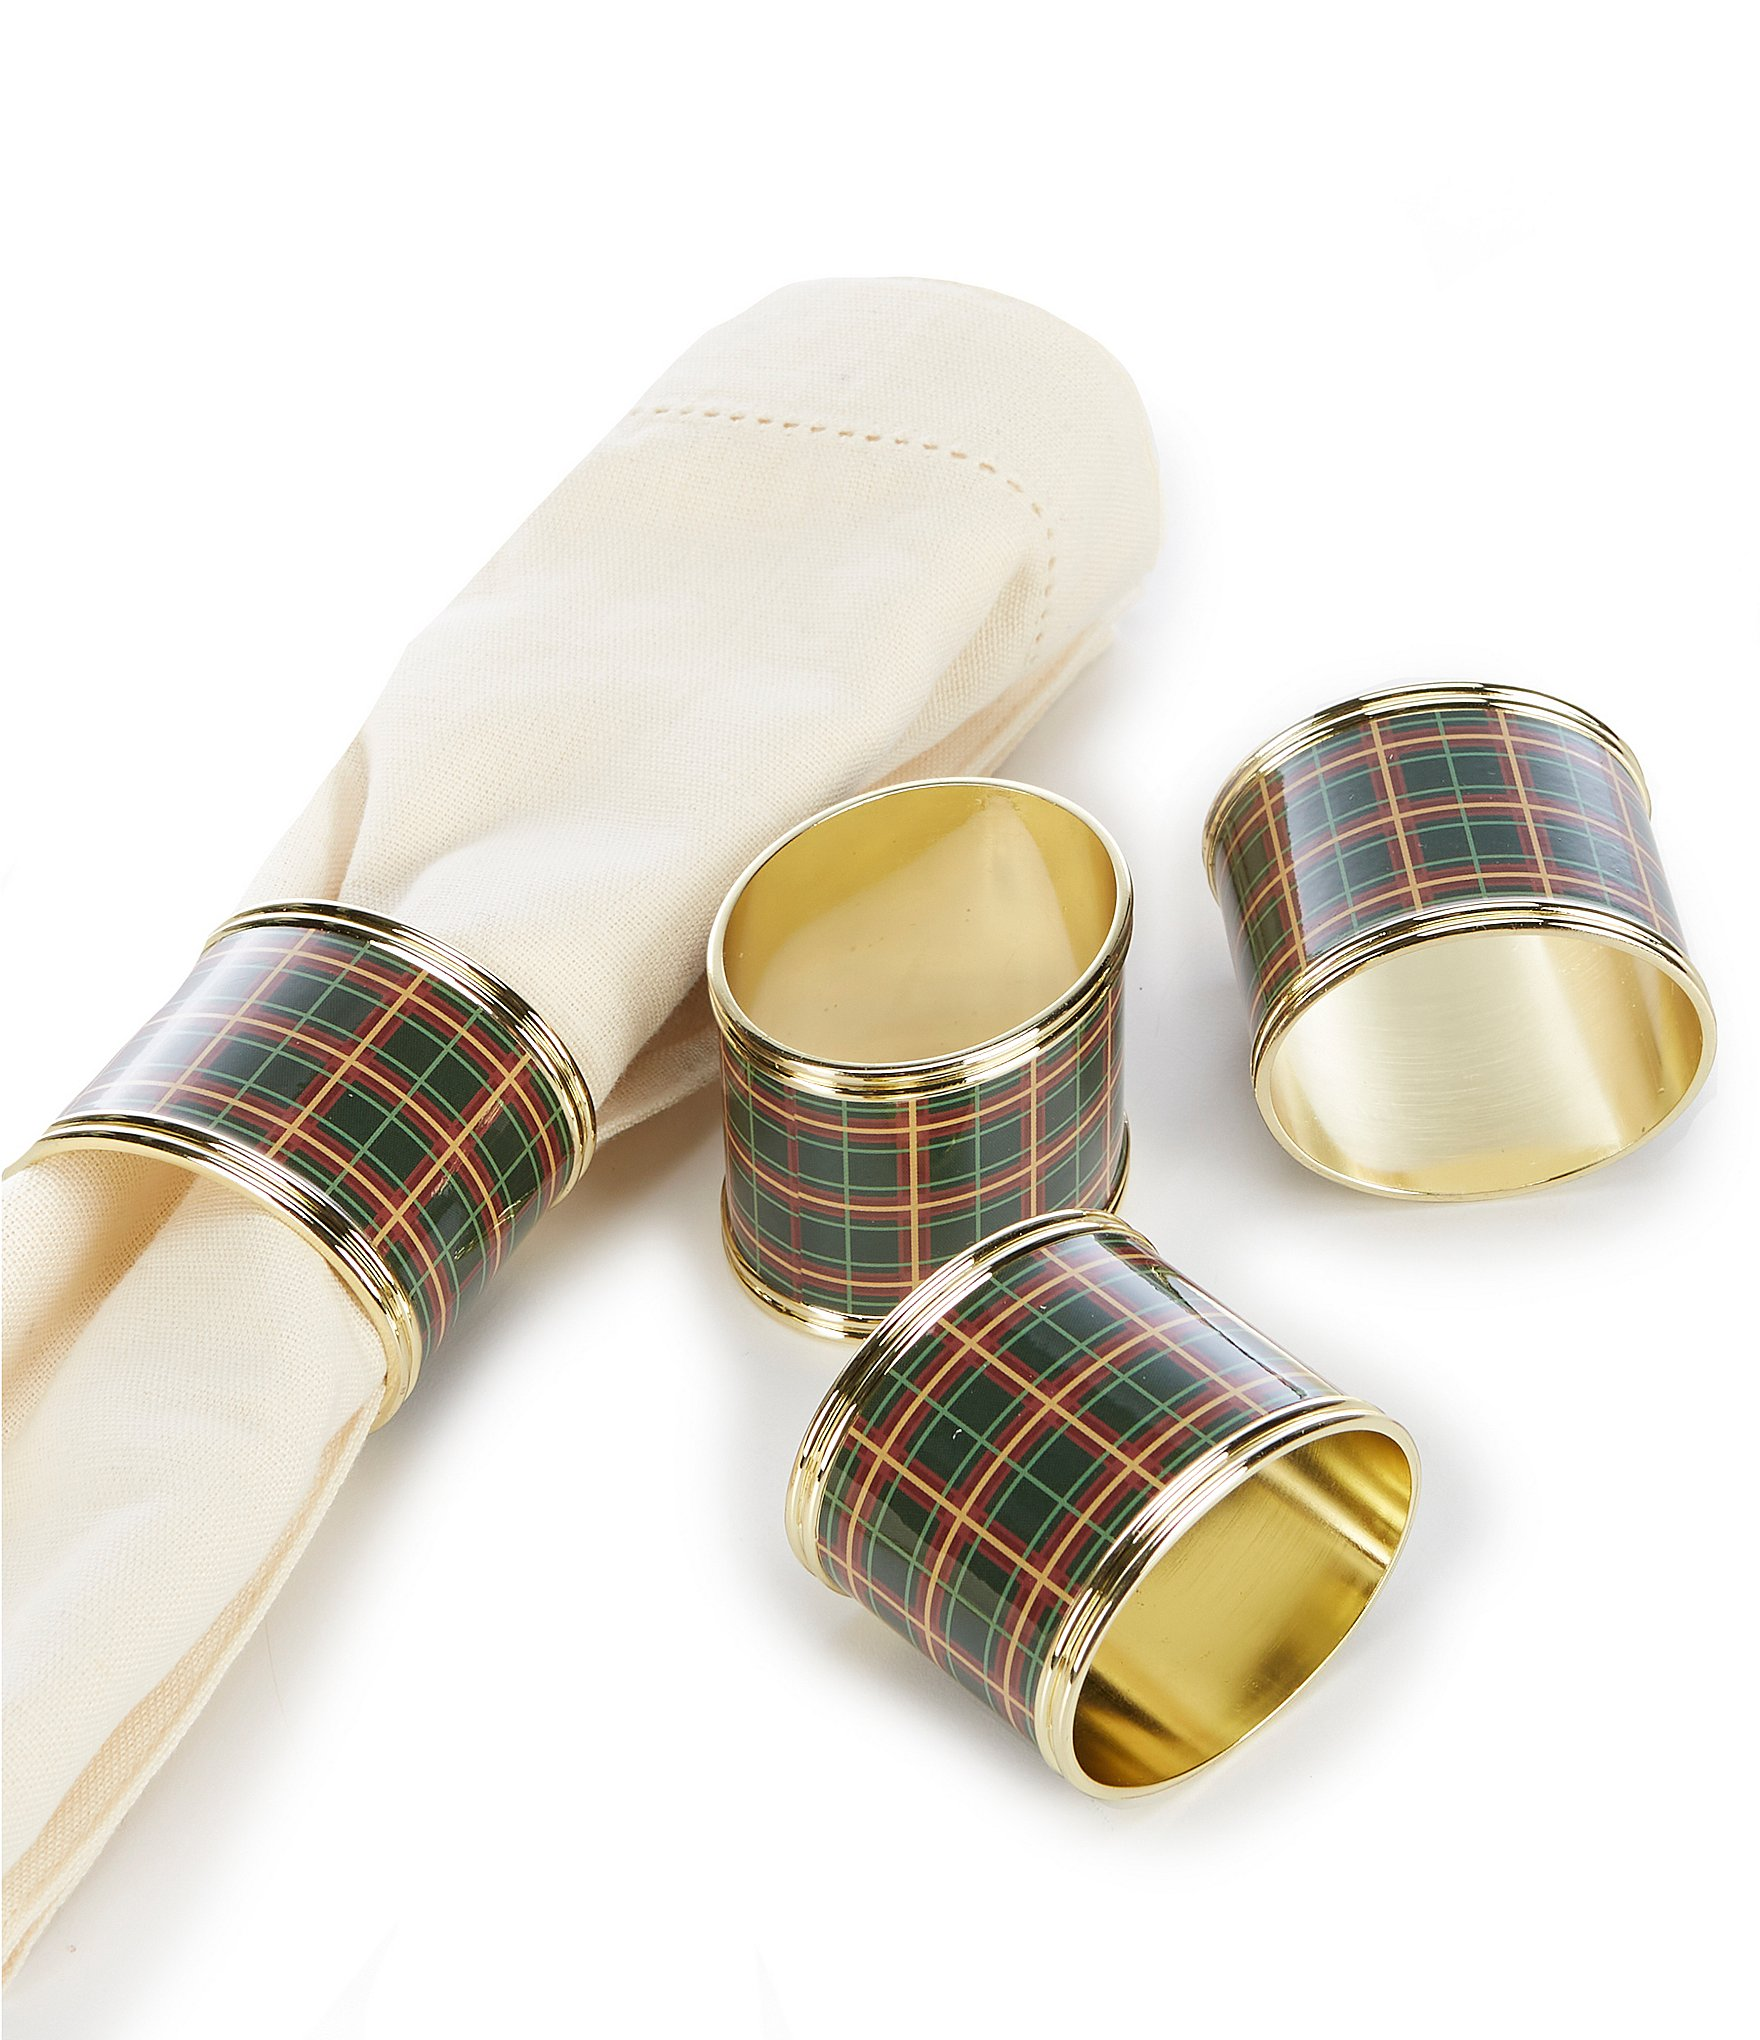 Lenox Holiday Nouveau Plaid Napkin Rings Set Of 4 Dillard S